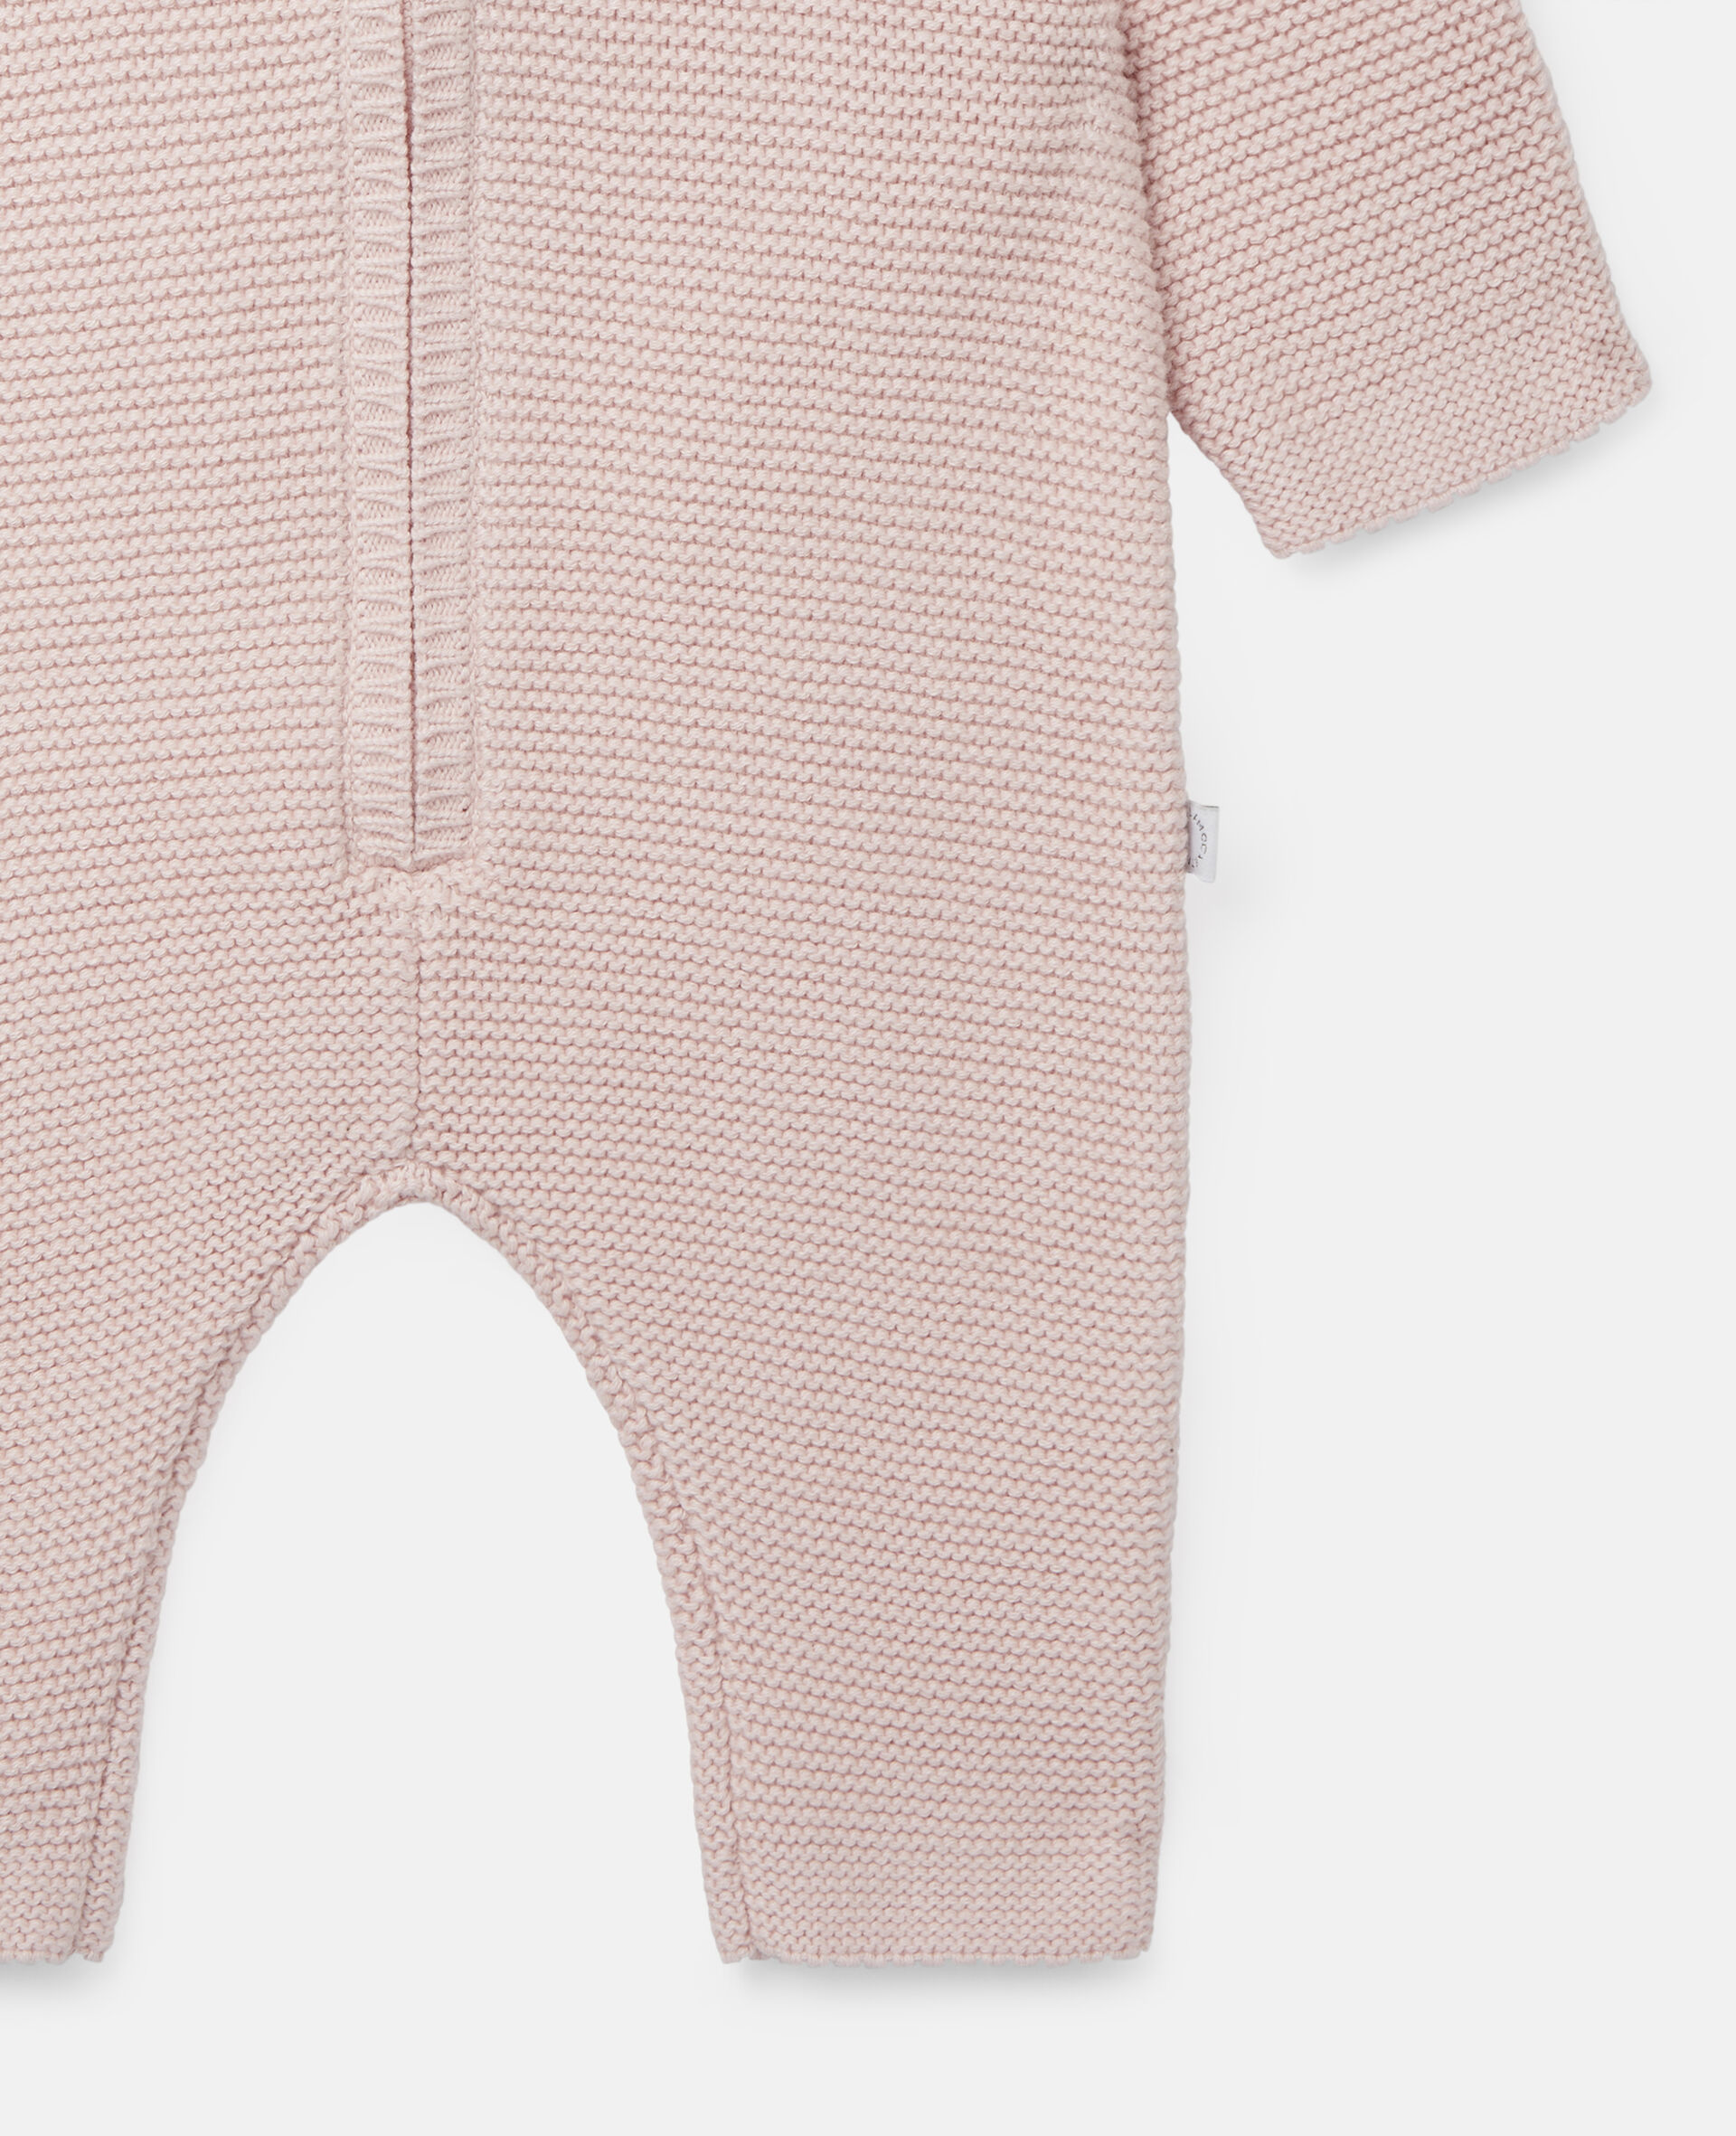 Doggie Knit Jumpsuit-Pink-large image number 2